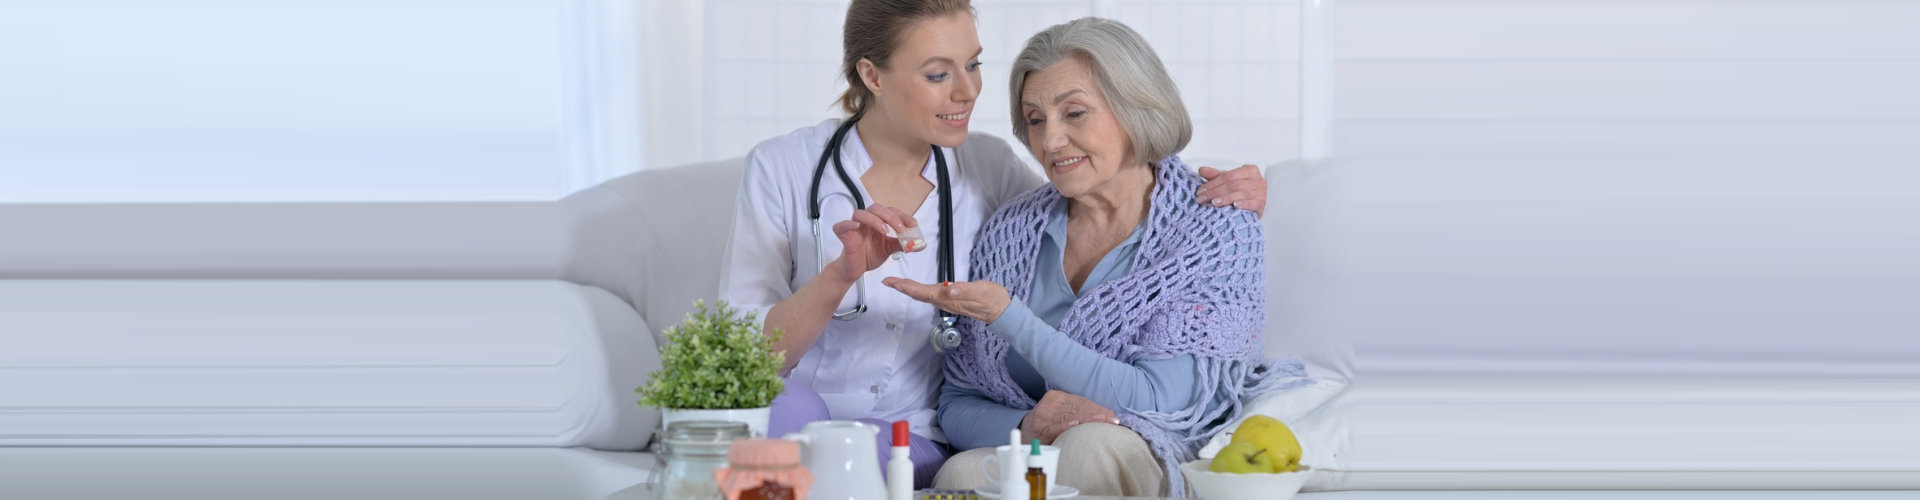 caregiver giving elder woman a medicine concept